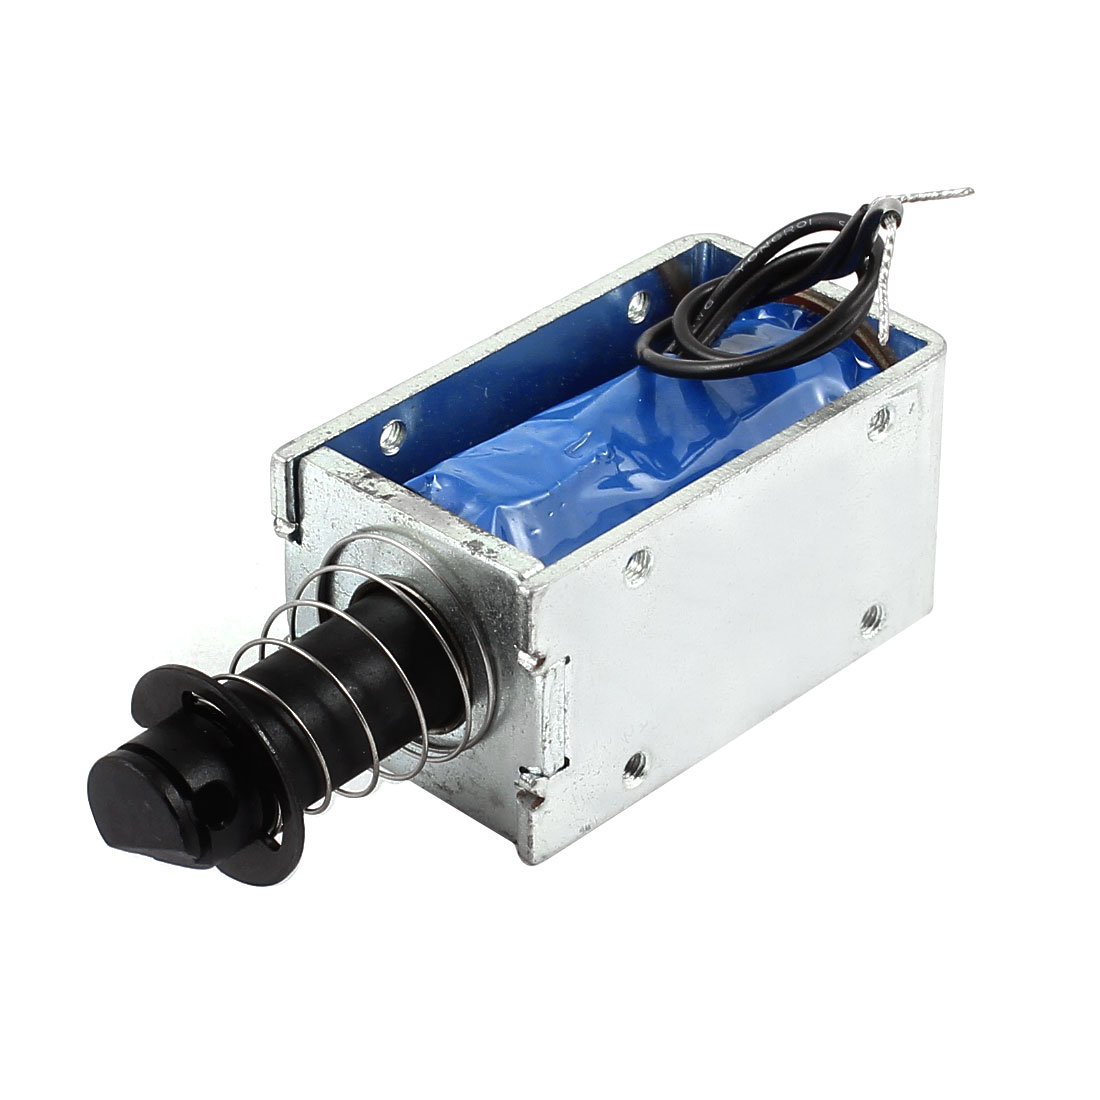 DC 24V 48W 7mm 800g Pull Type Spring Plunger Open Frame Linear Motion Solenoid Electromagnet Actuator